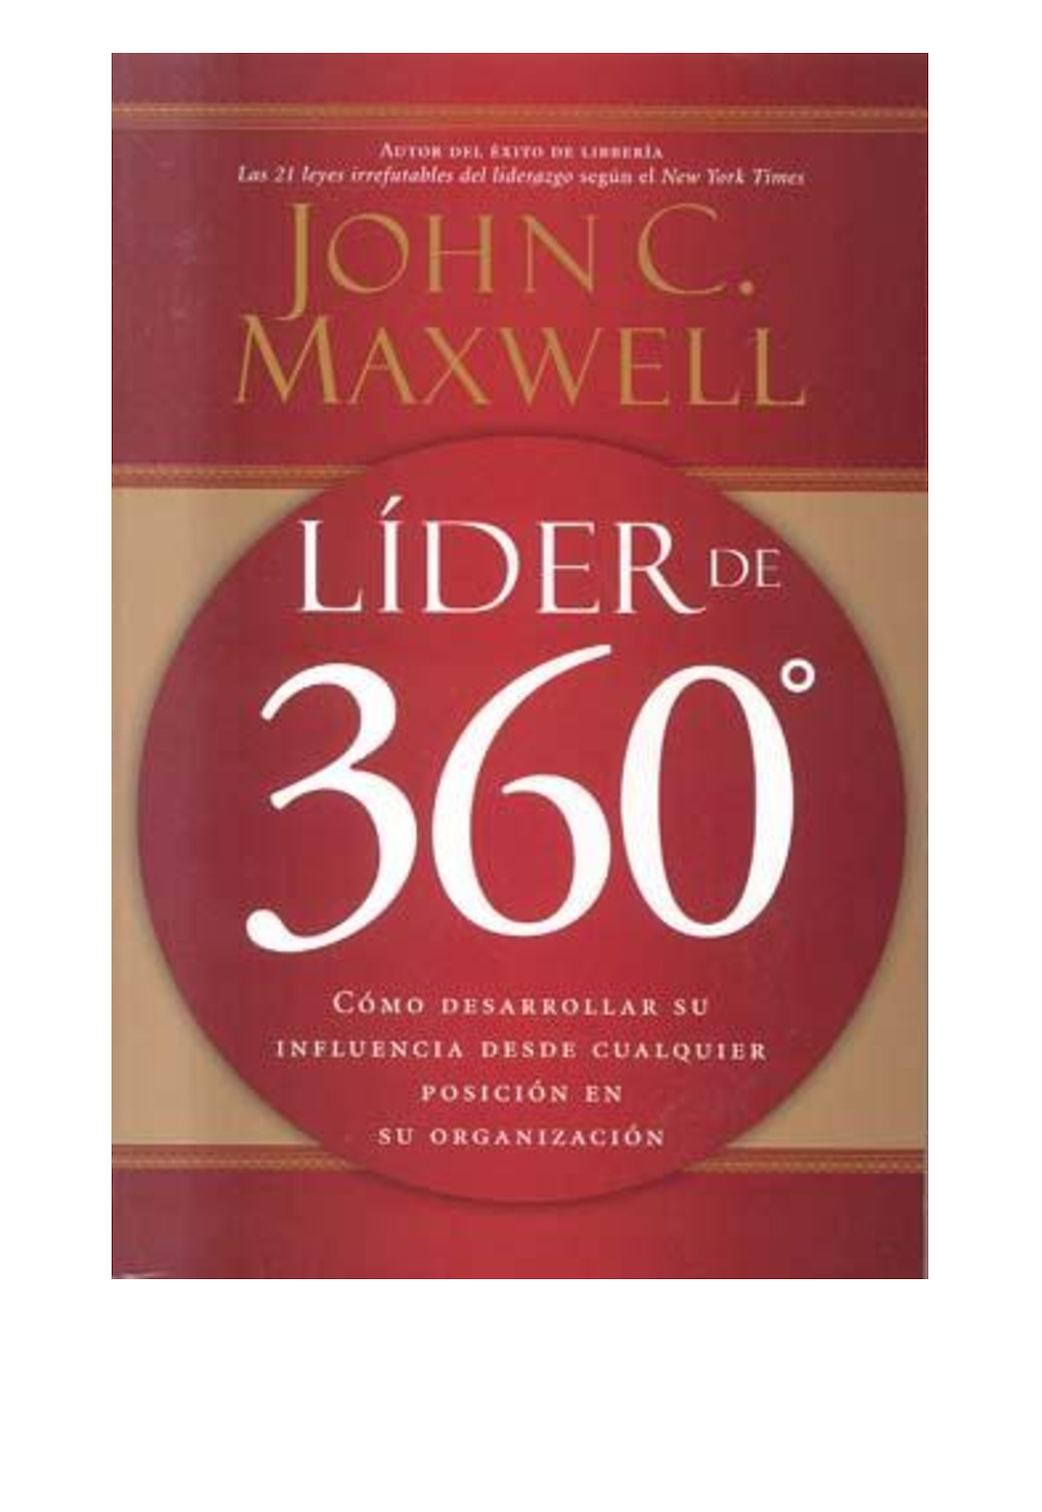 Calaméo - John C. Maxwell - O Líder 360 °. 9c2a62c0827c2